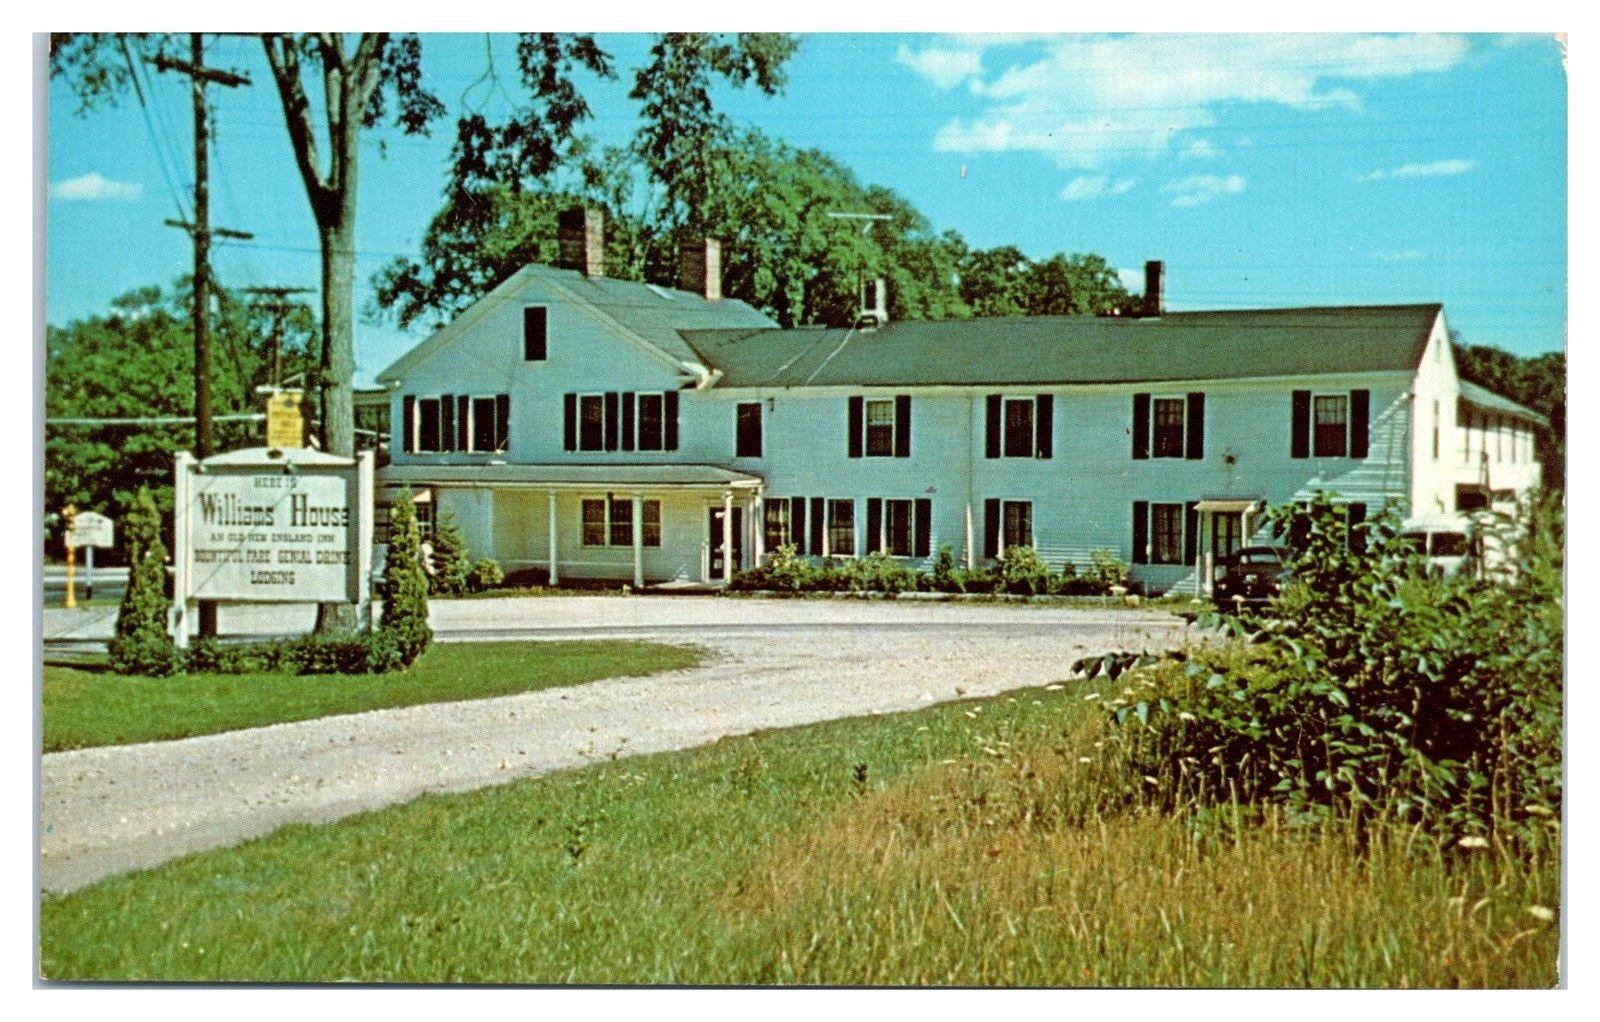 1950s60s Williams House Restaurant Cocktail Lounge Williamsburg